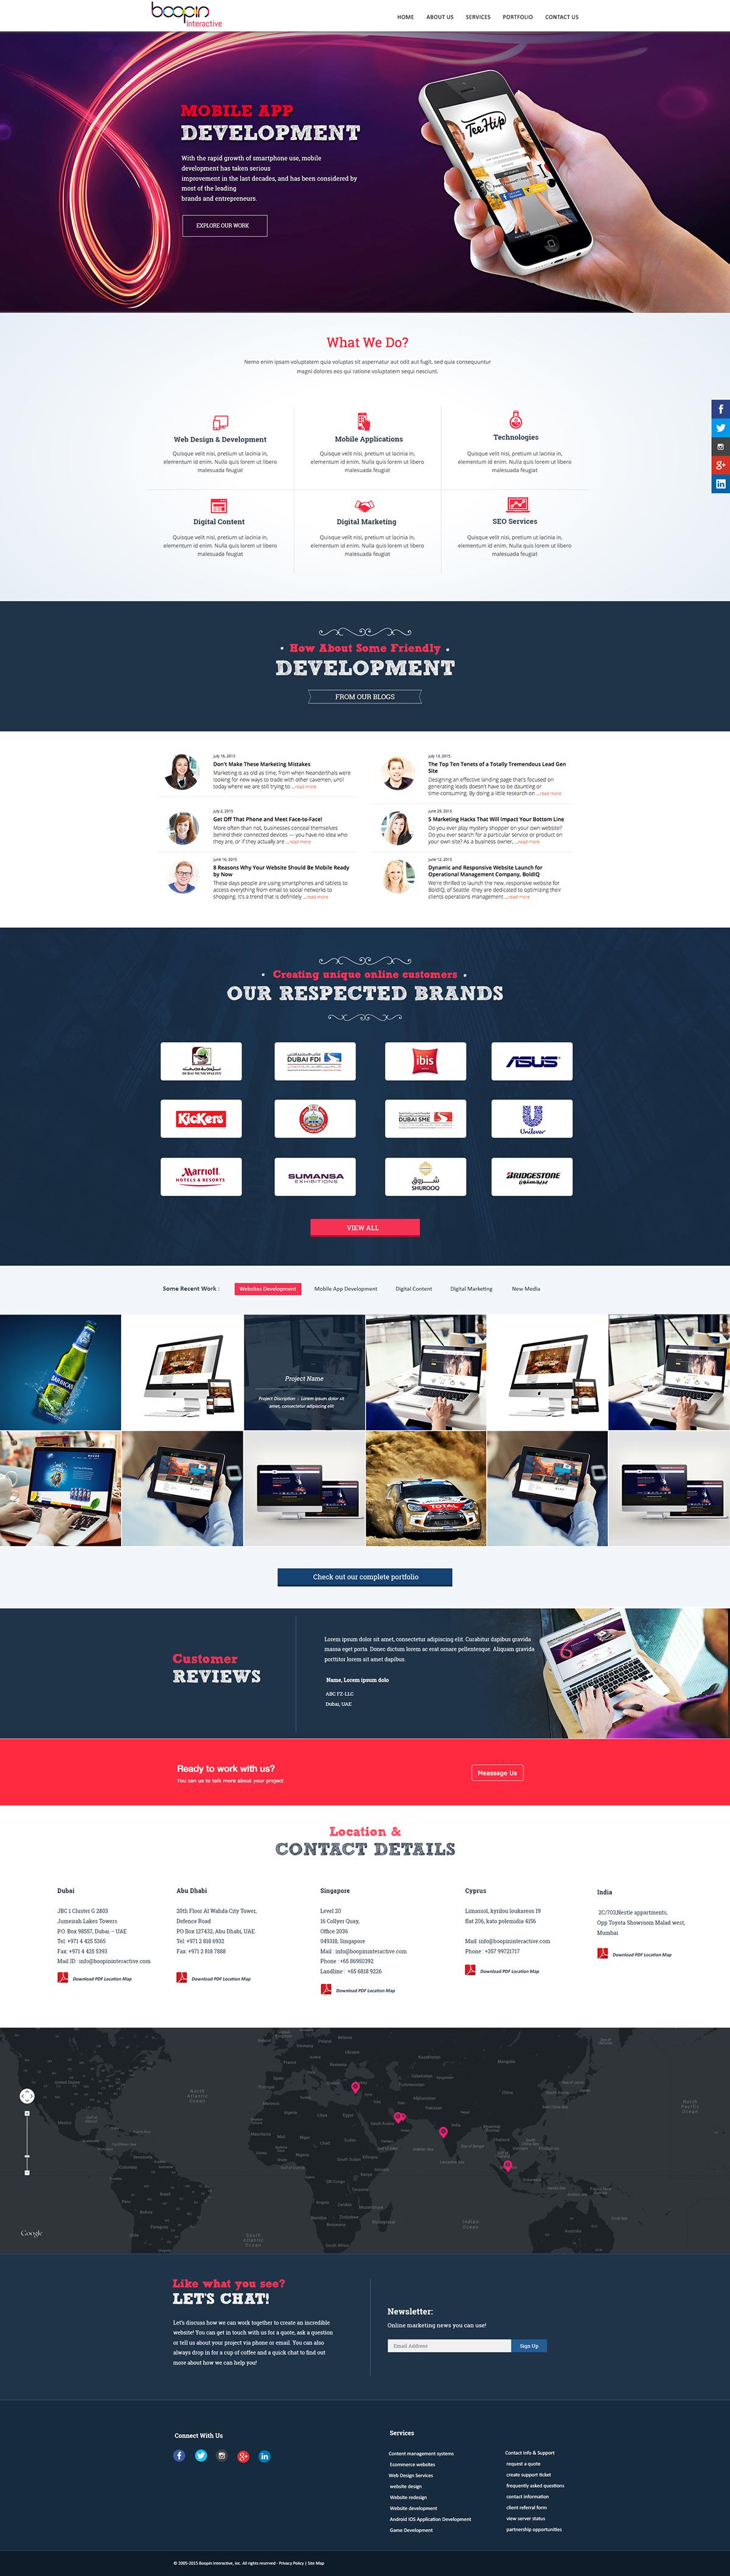 ui design simple design Clean Design dubai Advertising Agency in web ui designer vijith online vijithonline